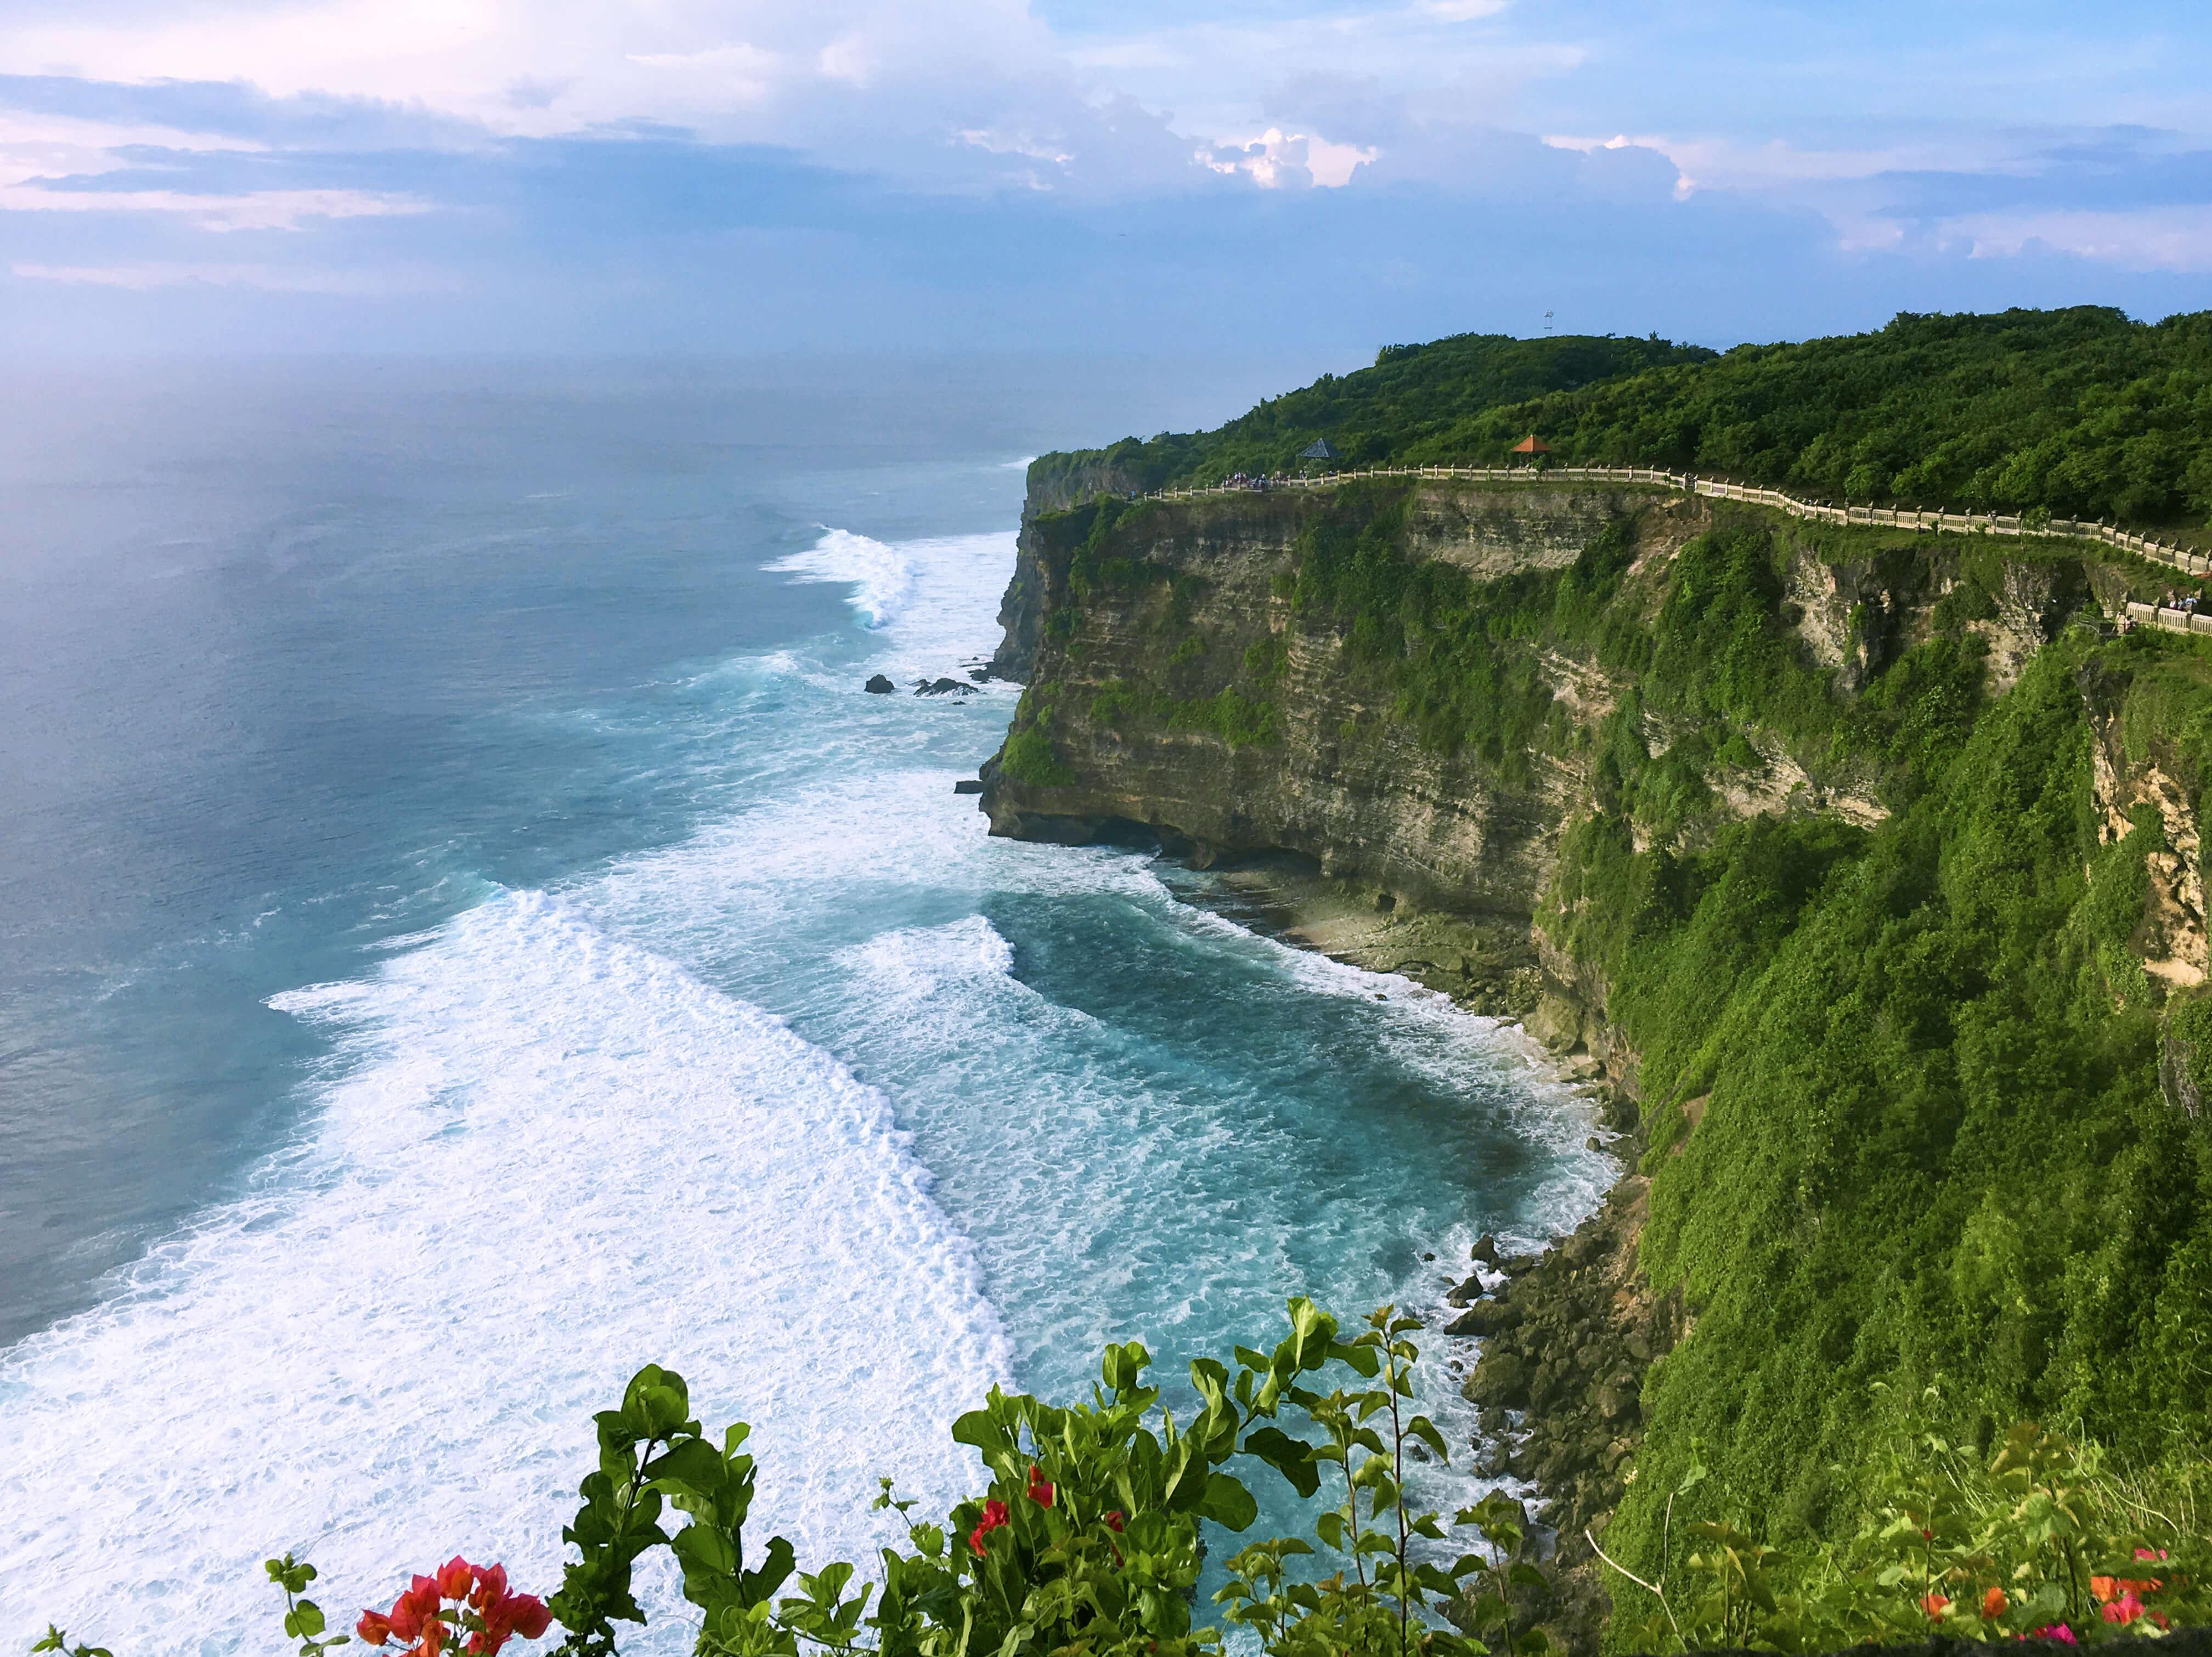 Indonesia, Bali, Bukit, beach, ocean, Индонезия, Бали, Букит, пляж, океан, утес